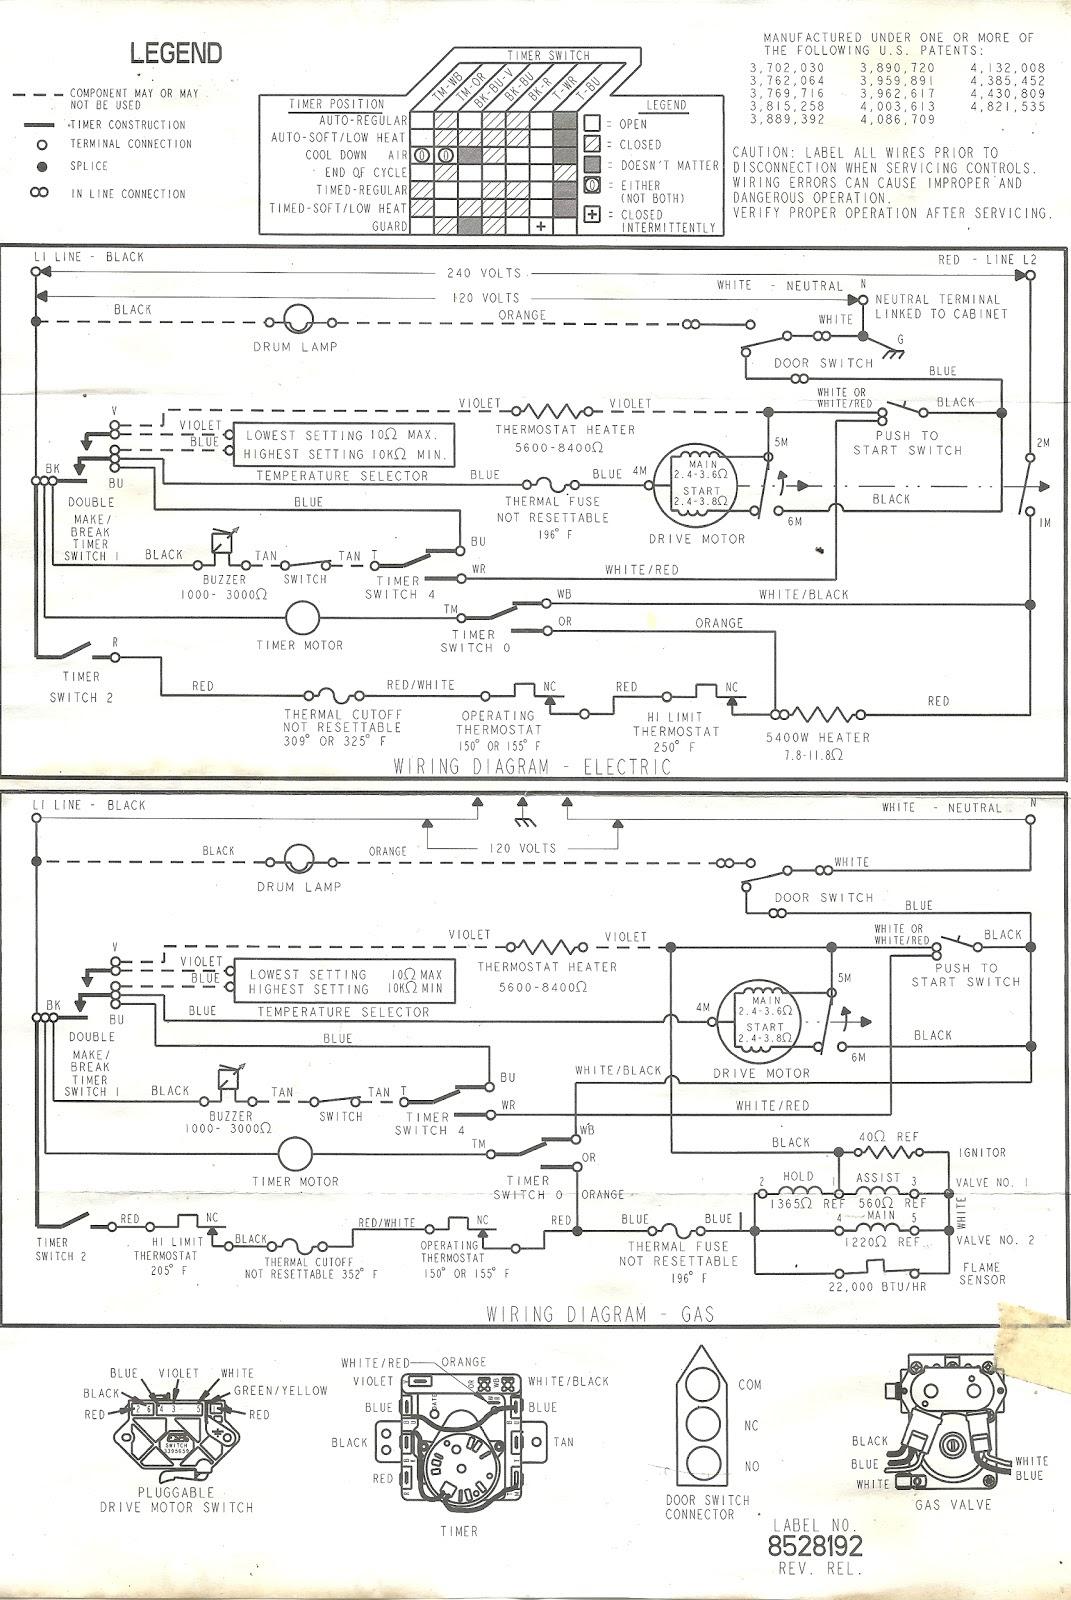 Diagram Whirlpool Dryer Wiring Diagram 240 Vac Full Version Hd Quality 240 Vac Digitalliv Ventoinpoppa It